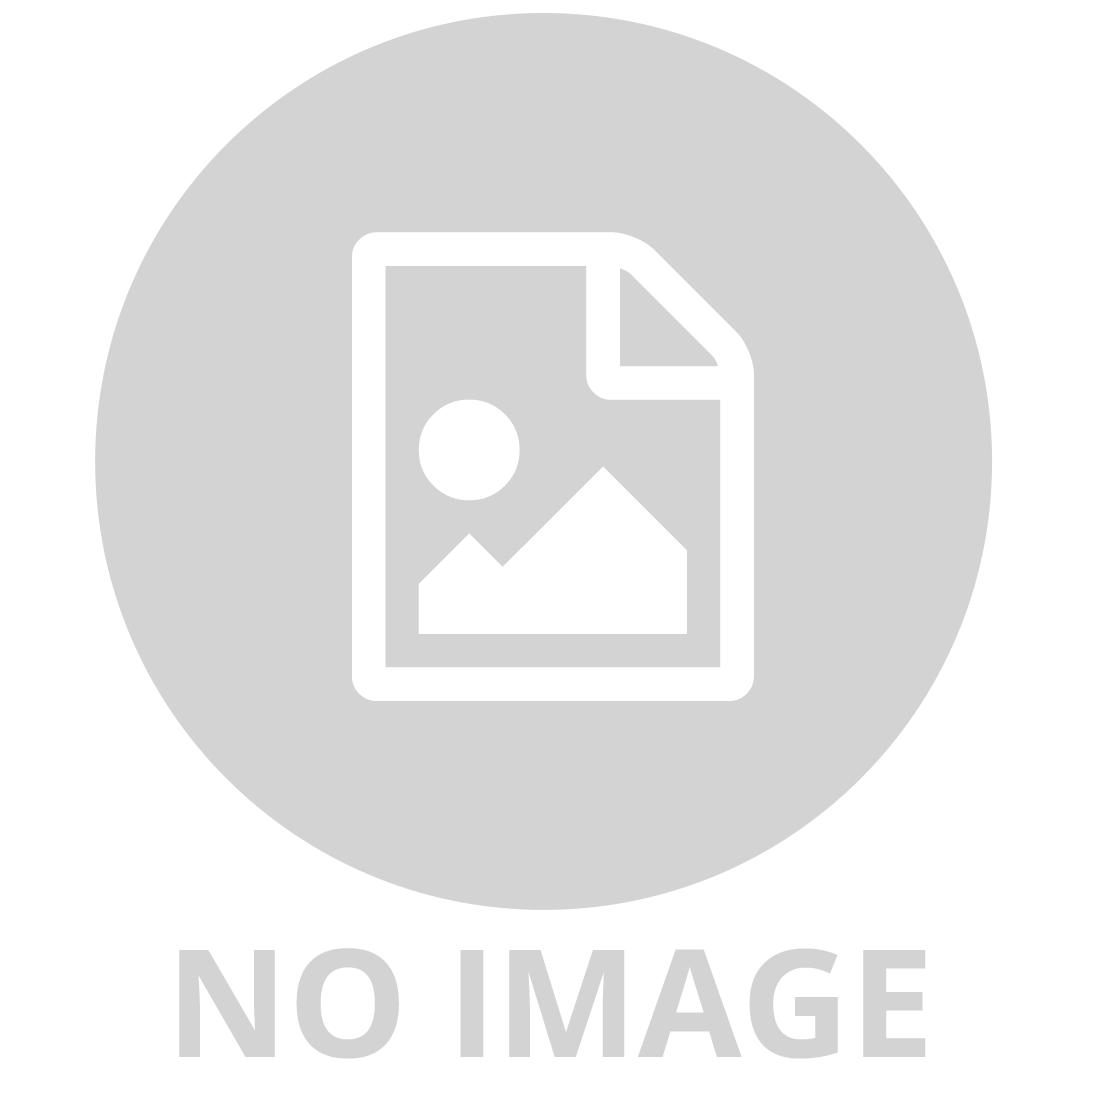 PLAYMOBIL SPIRIT 9475 LUCKY'S HAPPY HOME